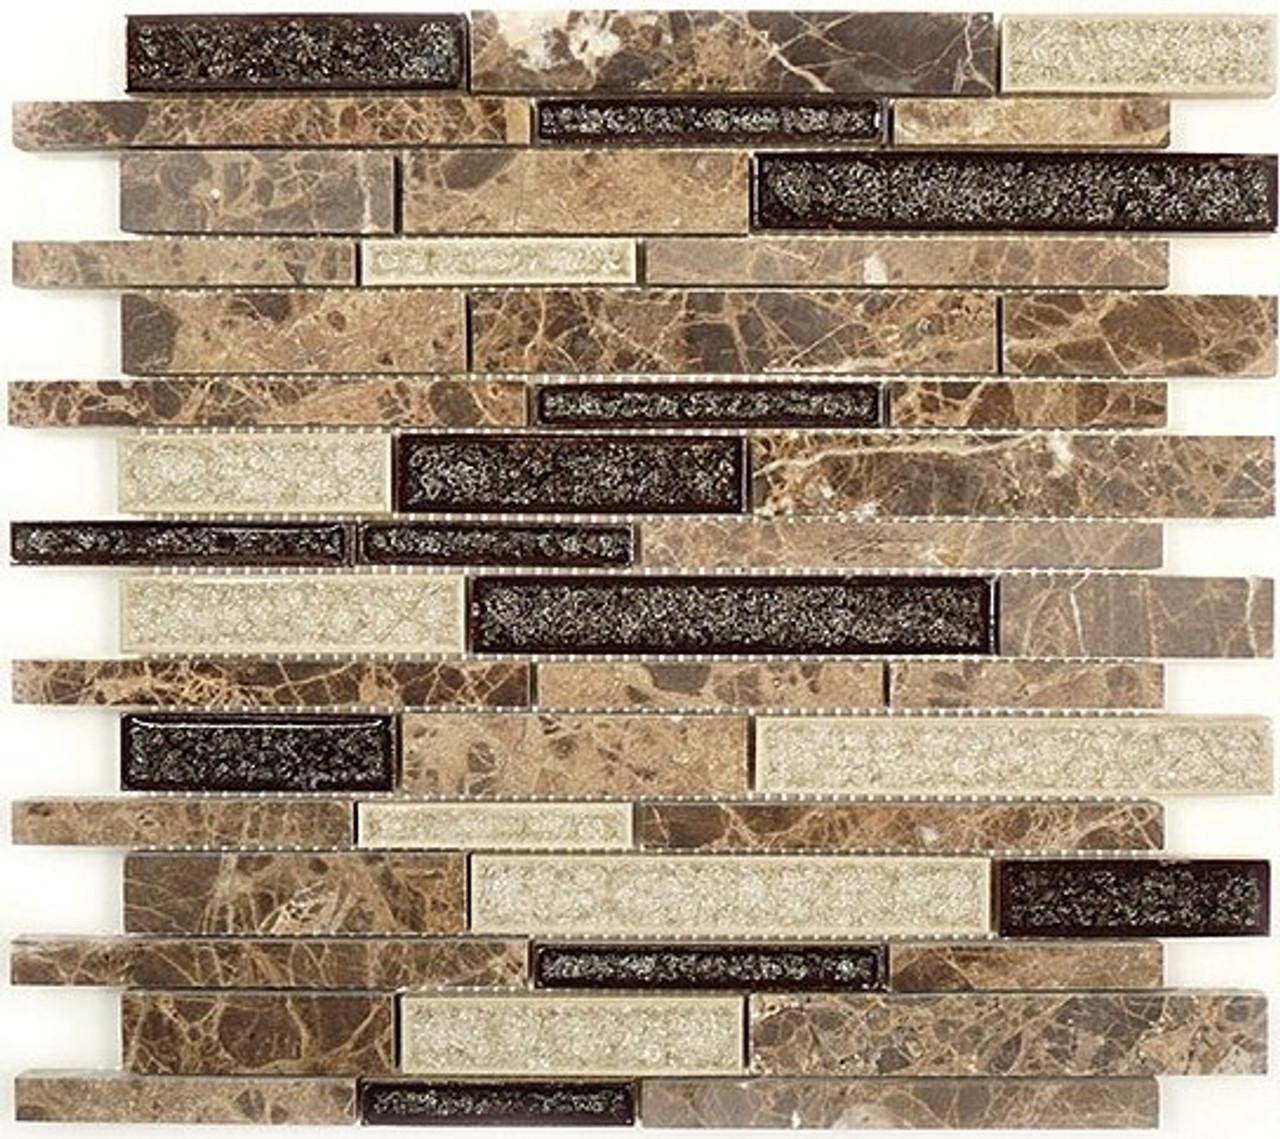 Bella Glass Tiles Tranquil Random Brick Series Mocha Canyon